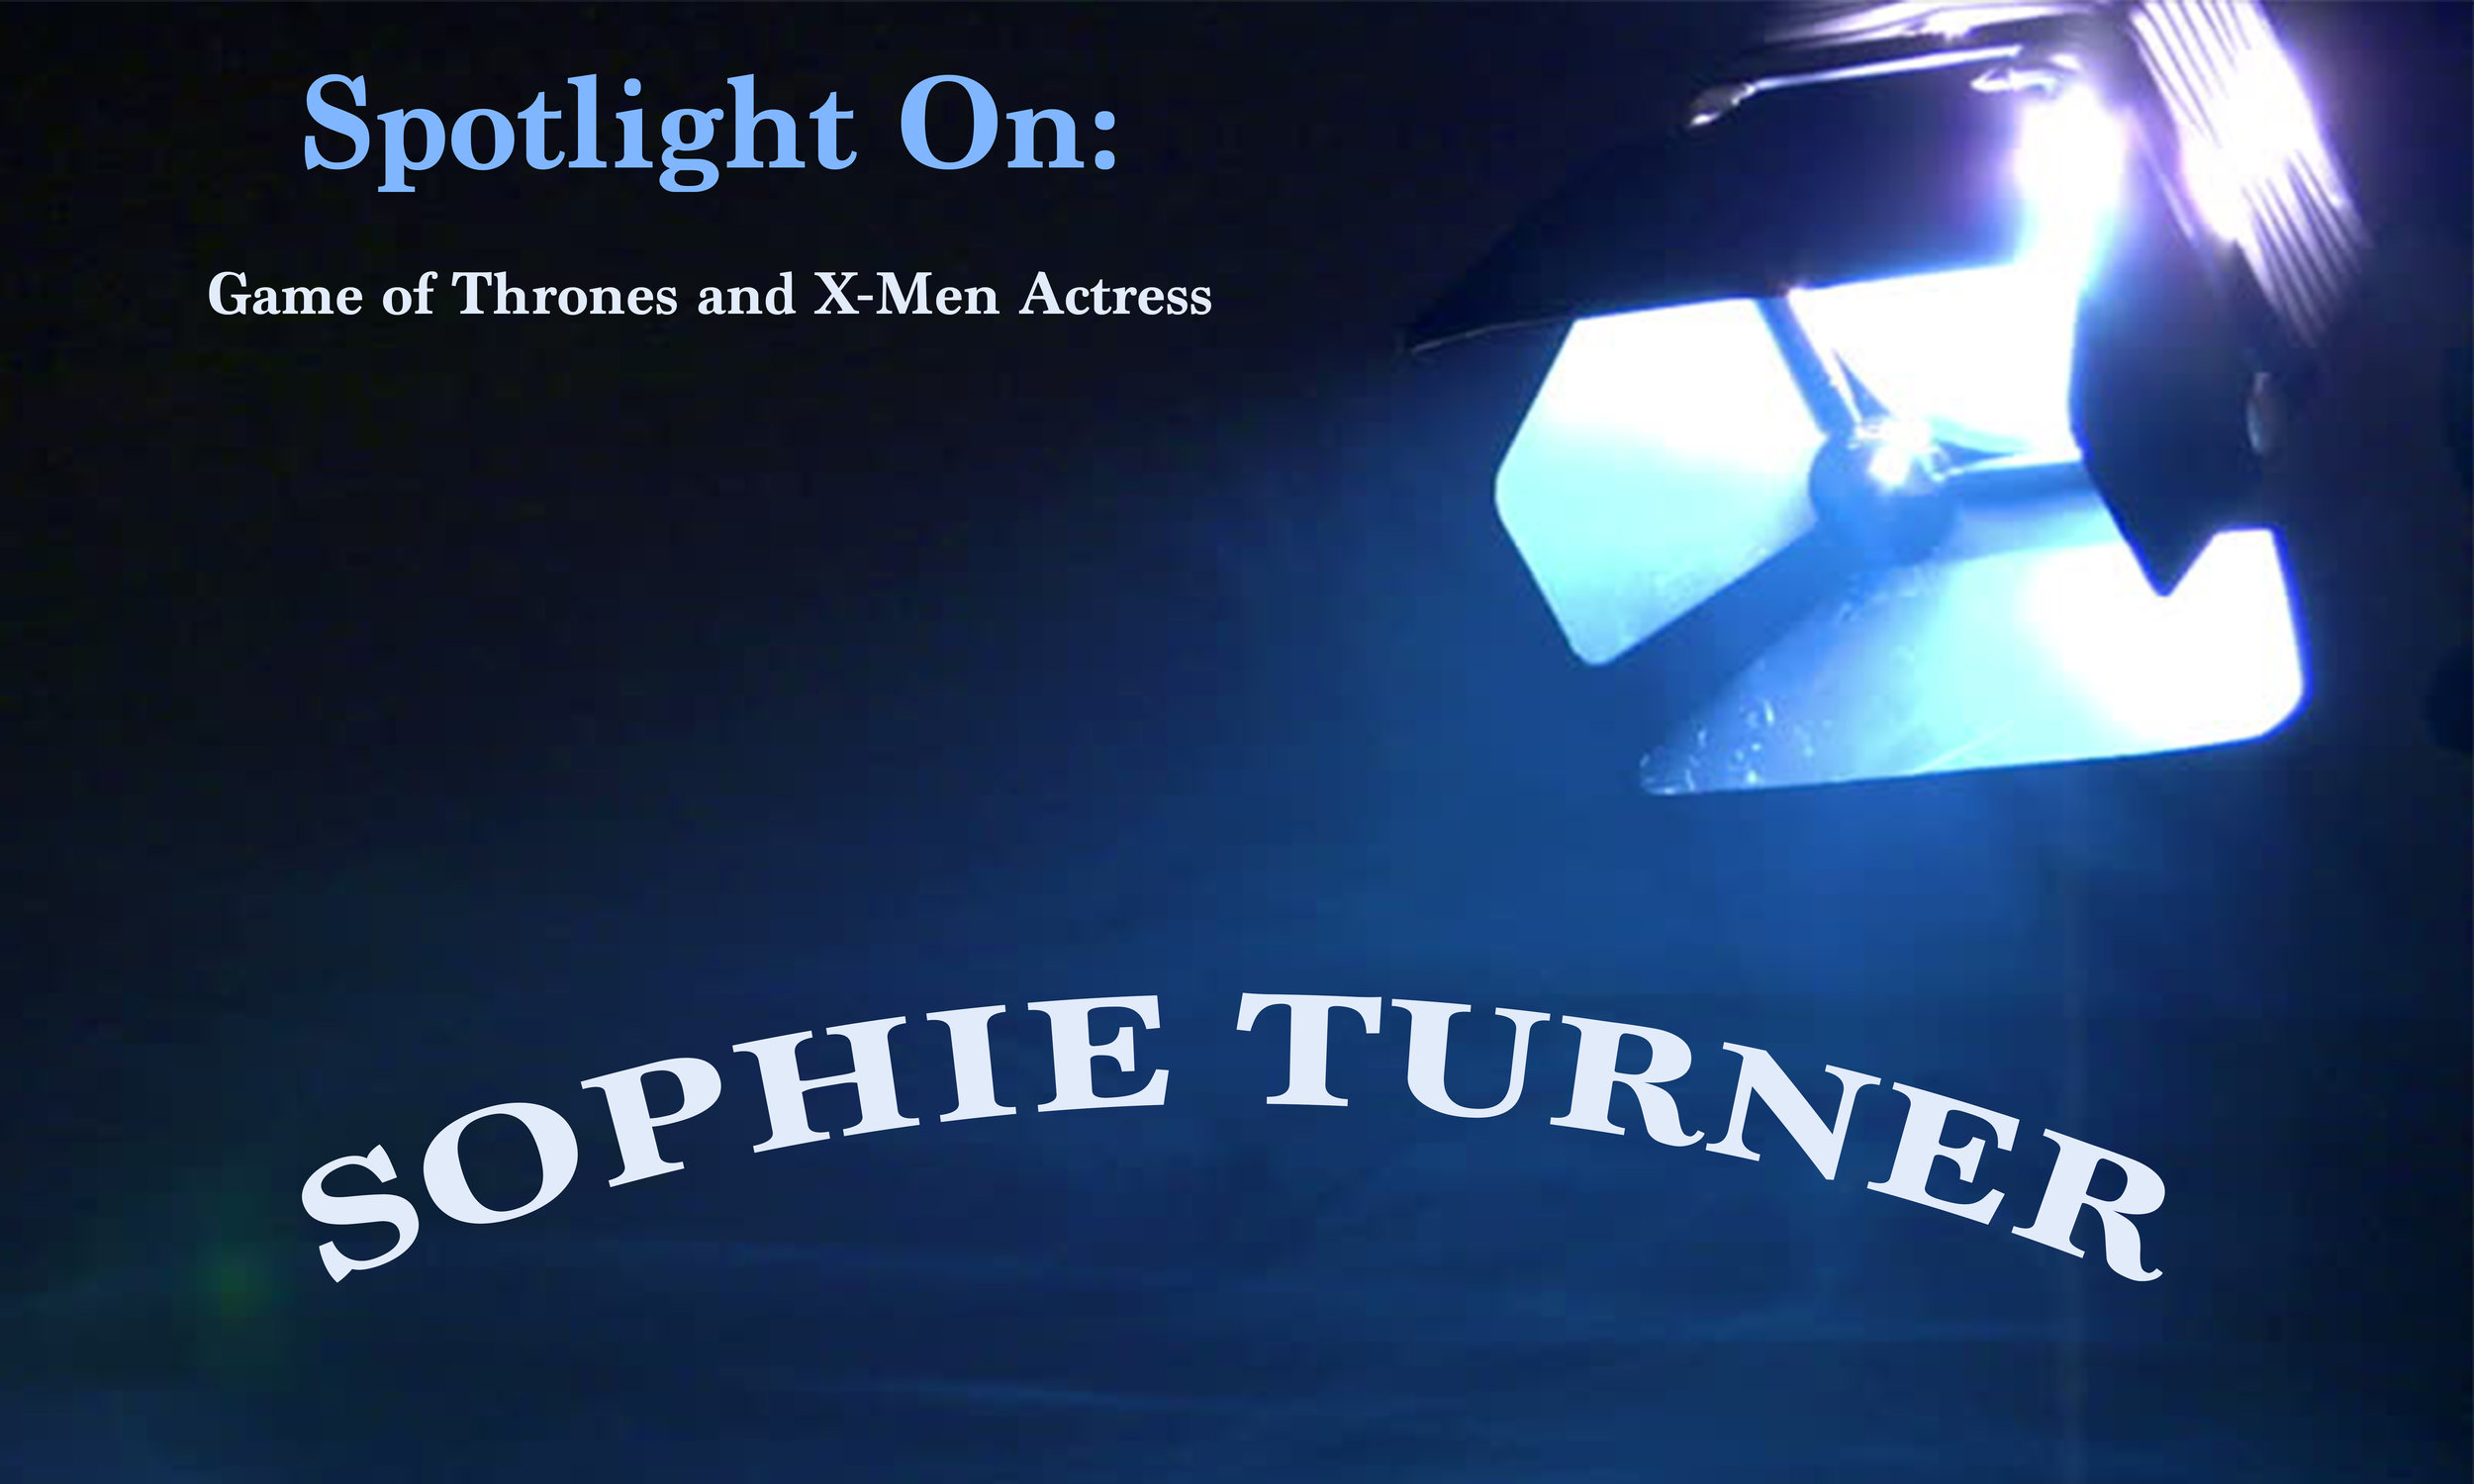 Spotlight on Sophie turner.jpg